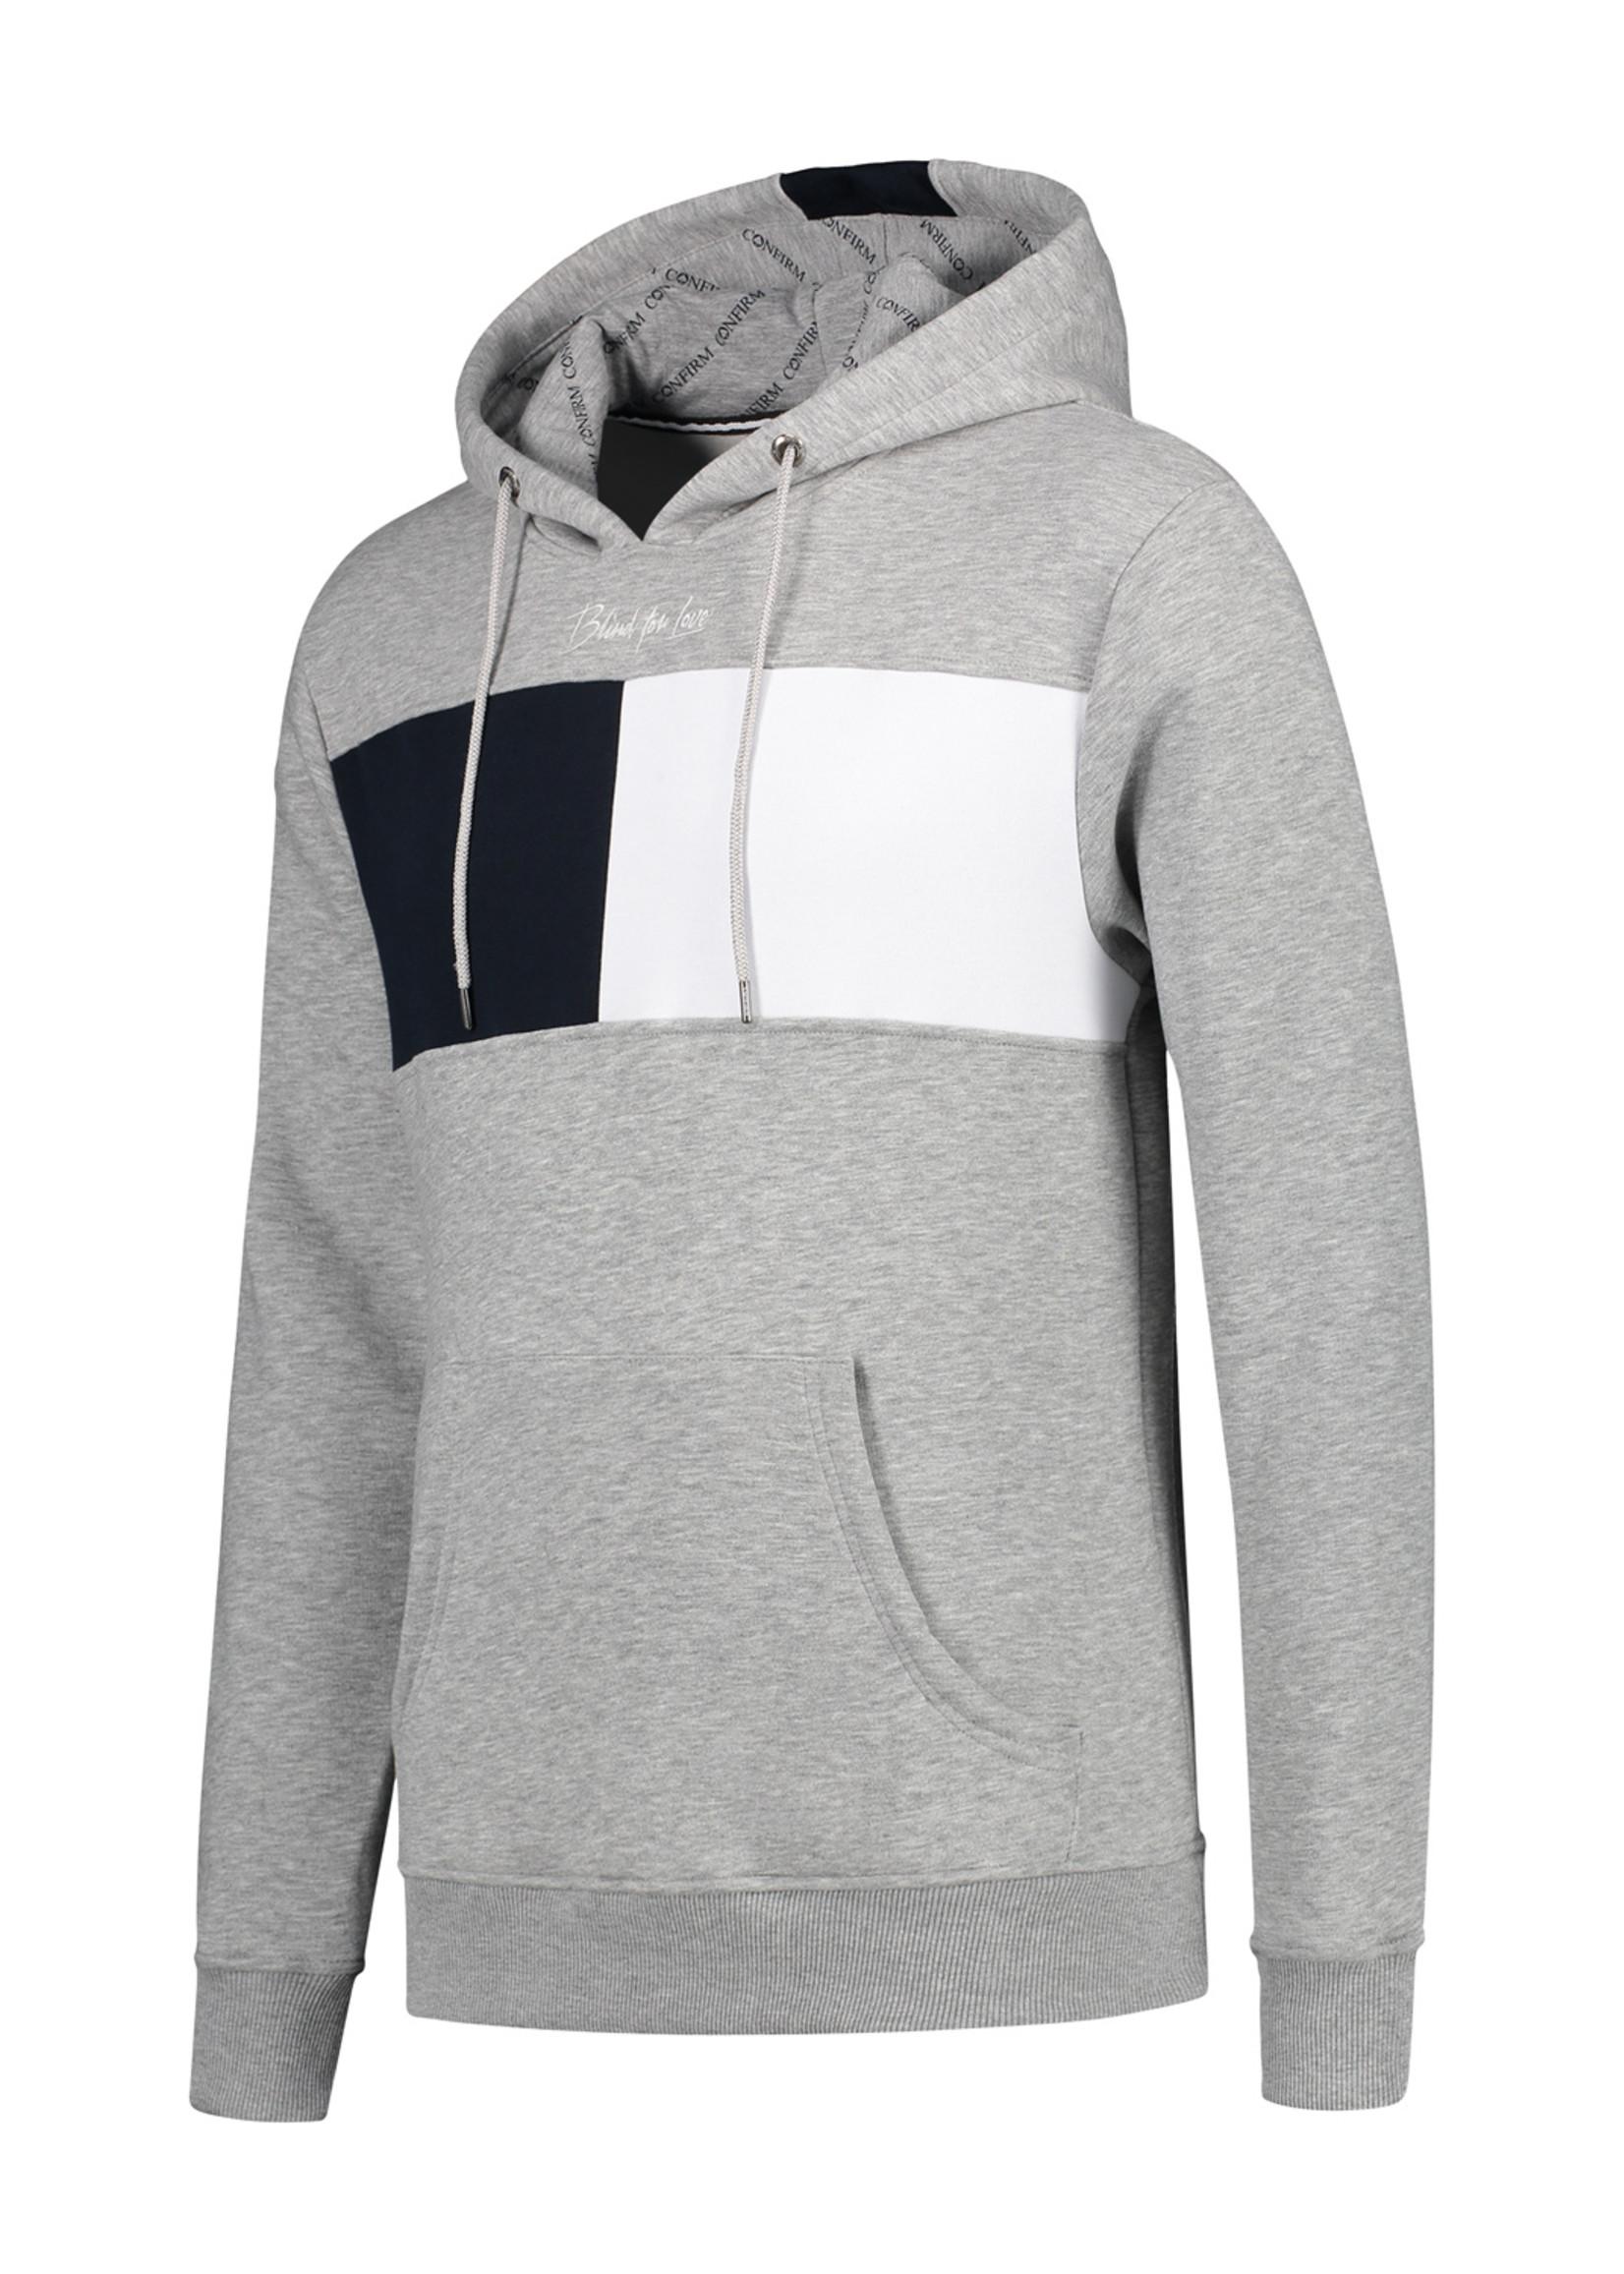 Confirm hoodie blind for love - grijs